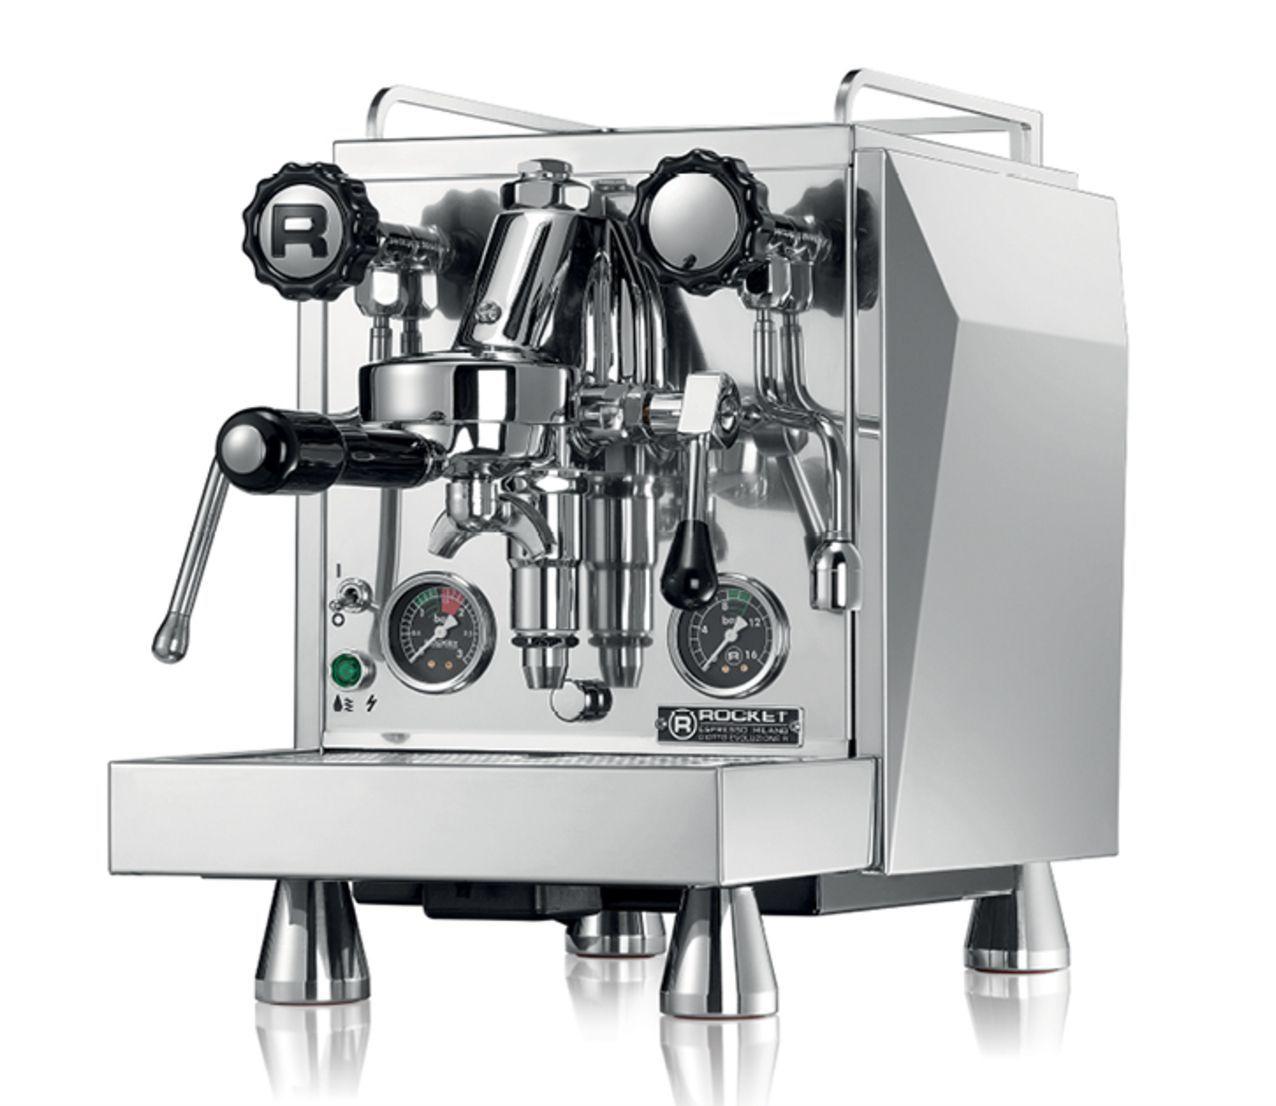 Faema Espresso Machine